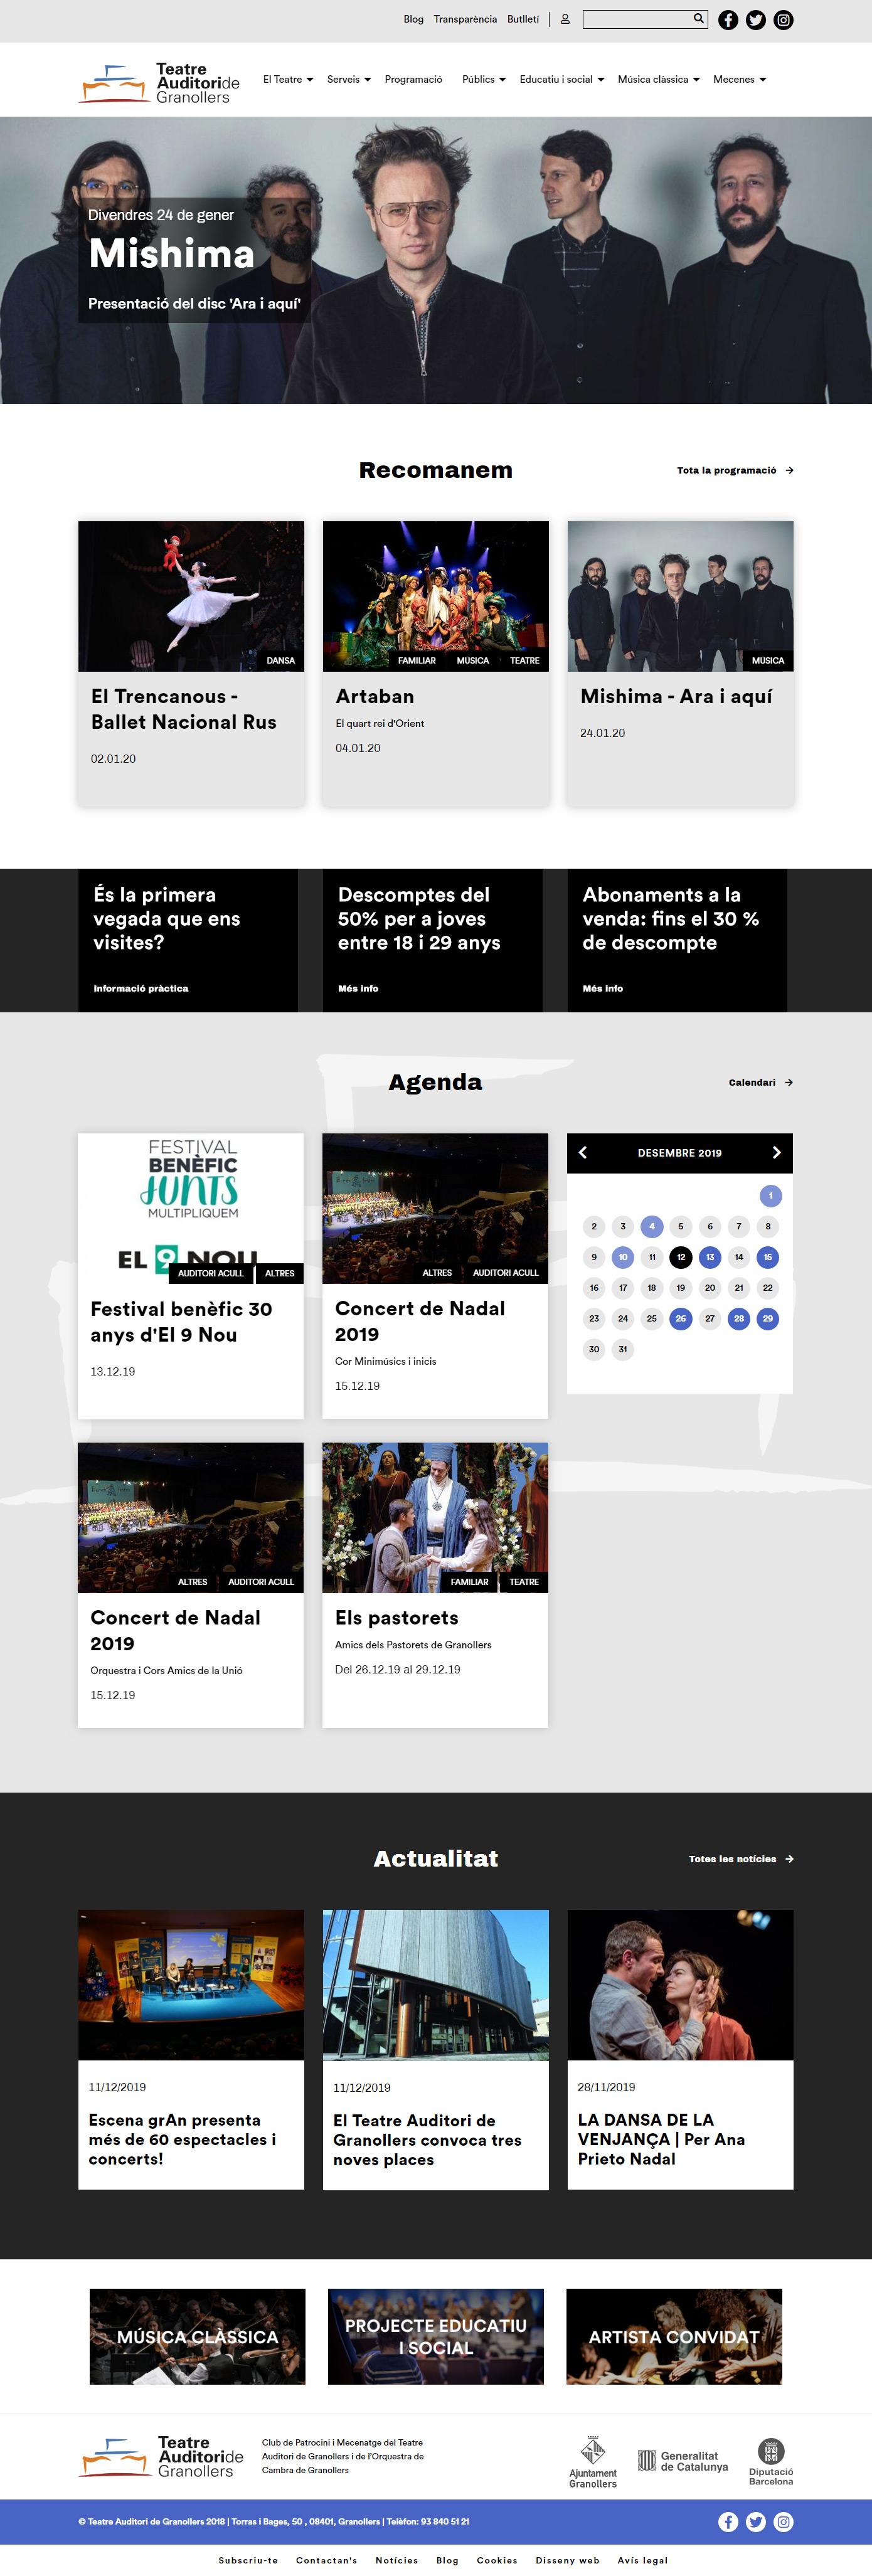 Teatre Auditori de Granollers - Homepage